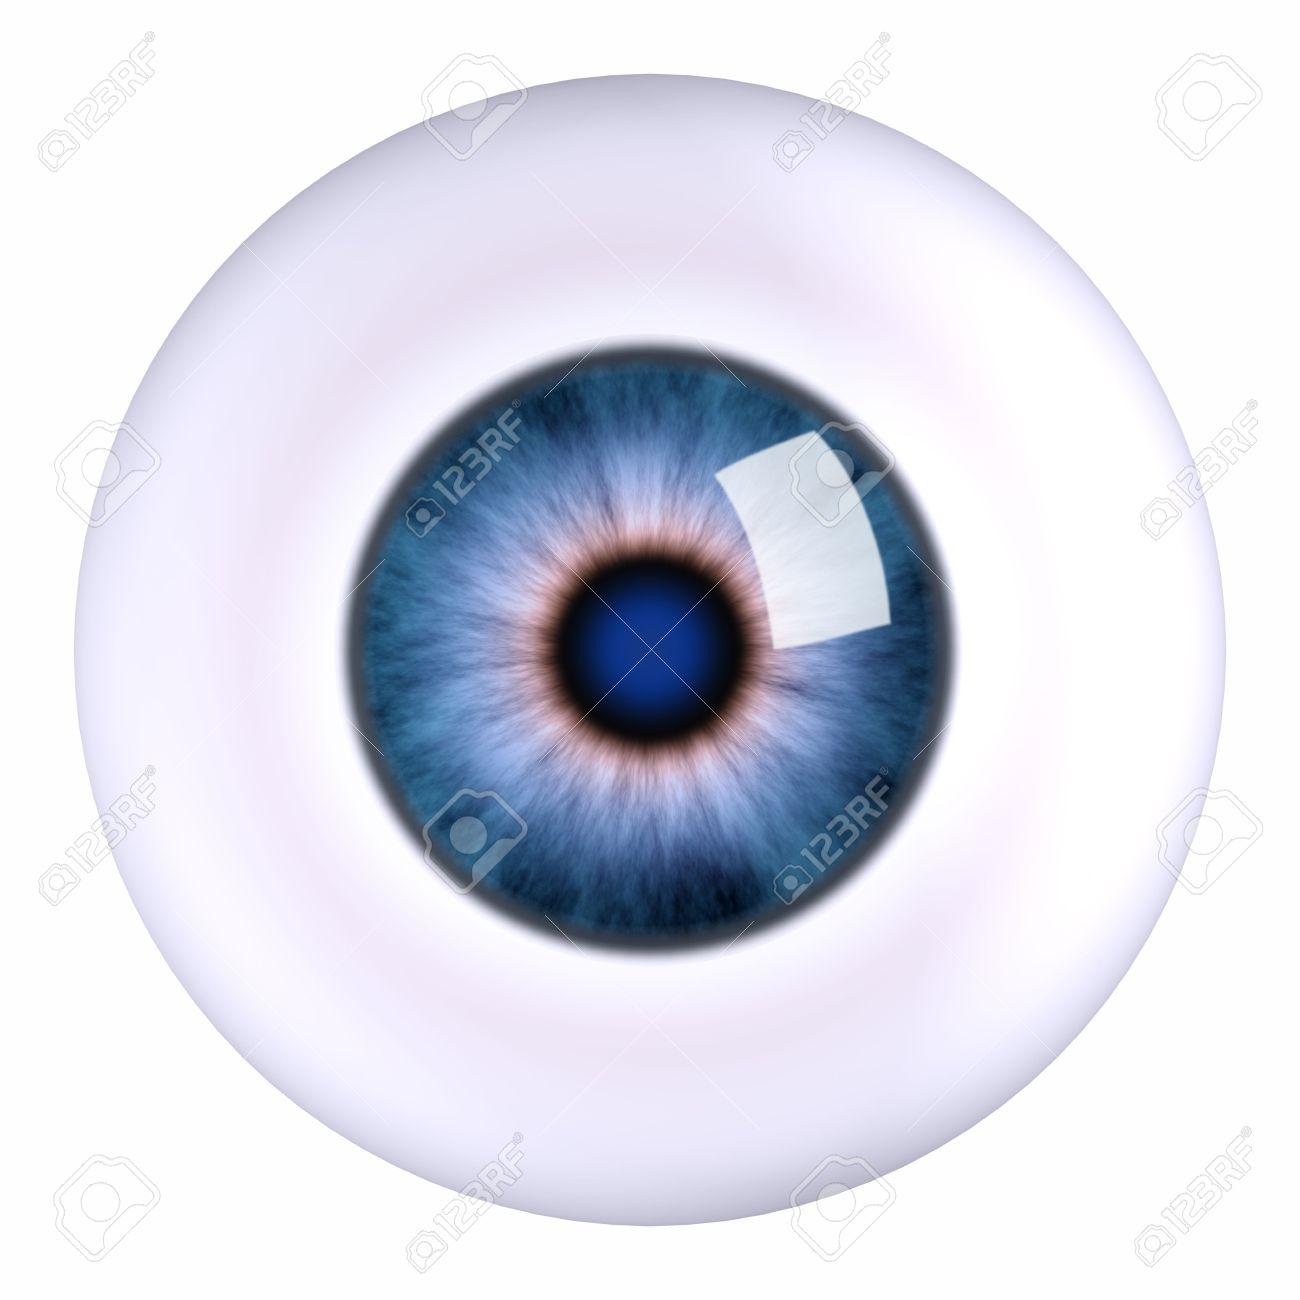 3d model eyeball blue, isolated Stock Photo - 3102022